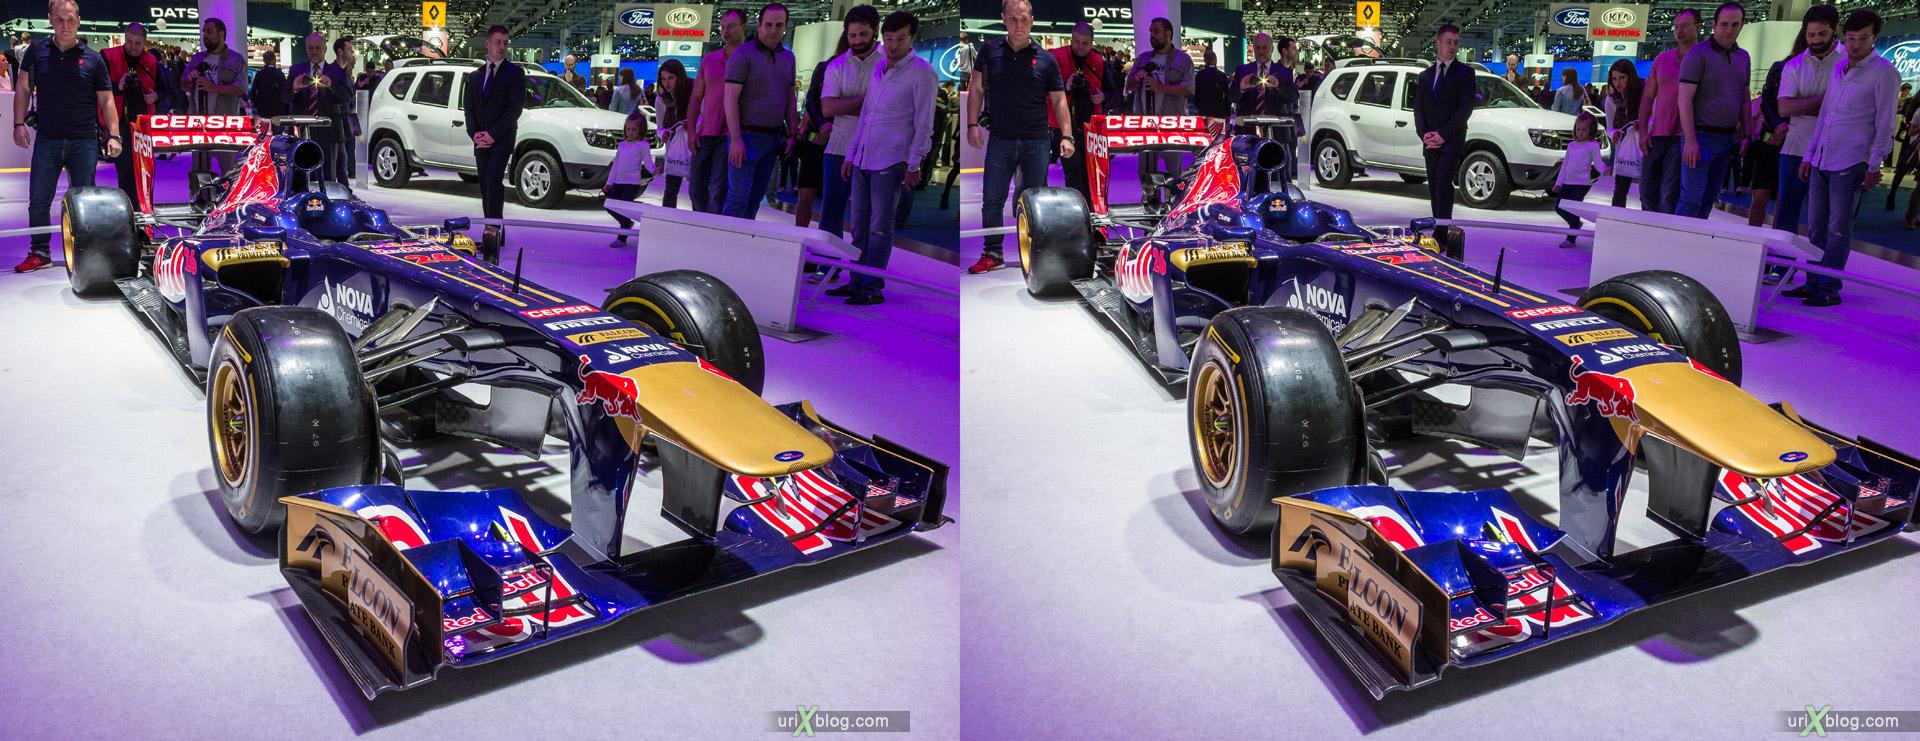 2014, Moscow International Automobile Salon, MIAS, Crocus Expo, Moscow, Russia, augest, 3D, stereo pair, cross-eyed, crossview, cross view stereo pair, stereoscopic